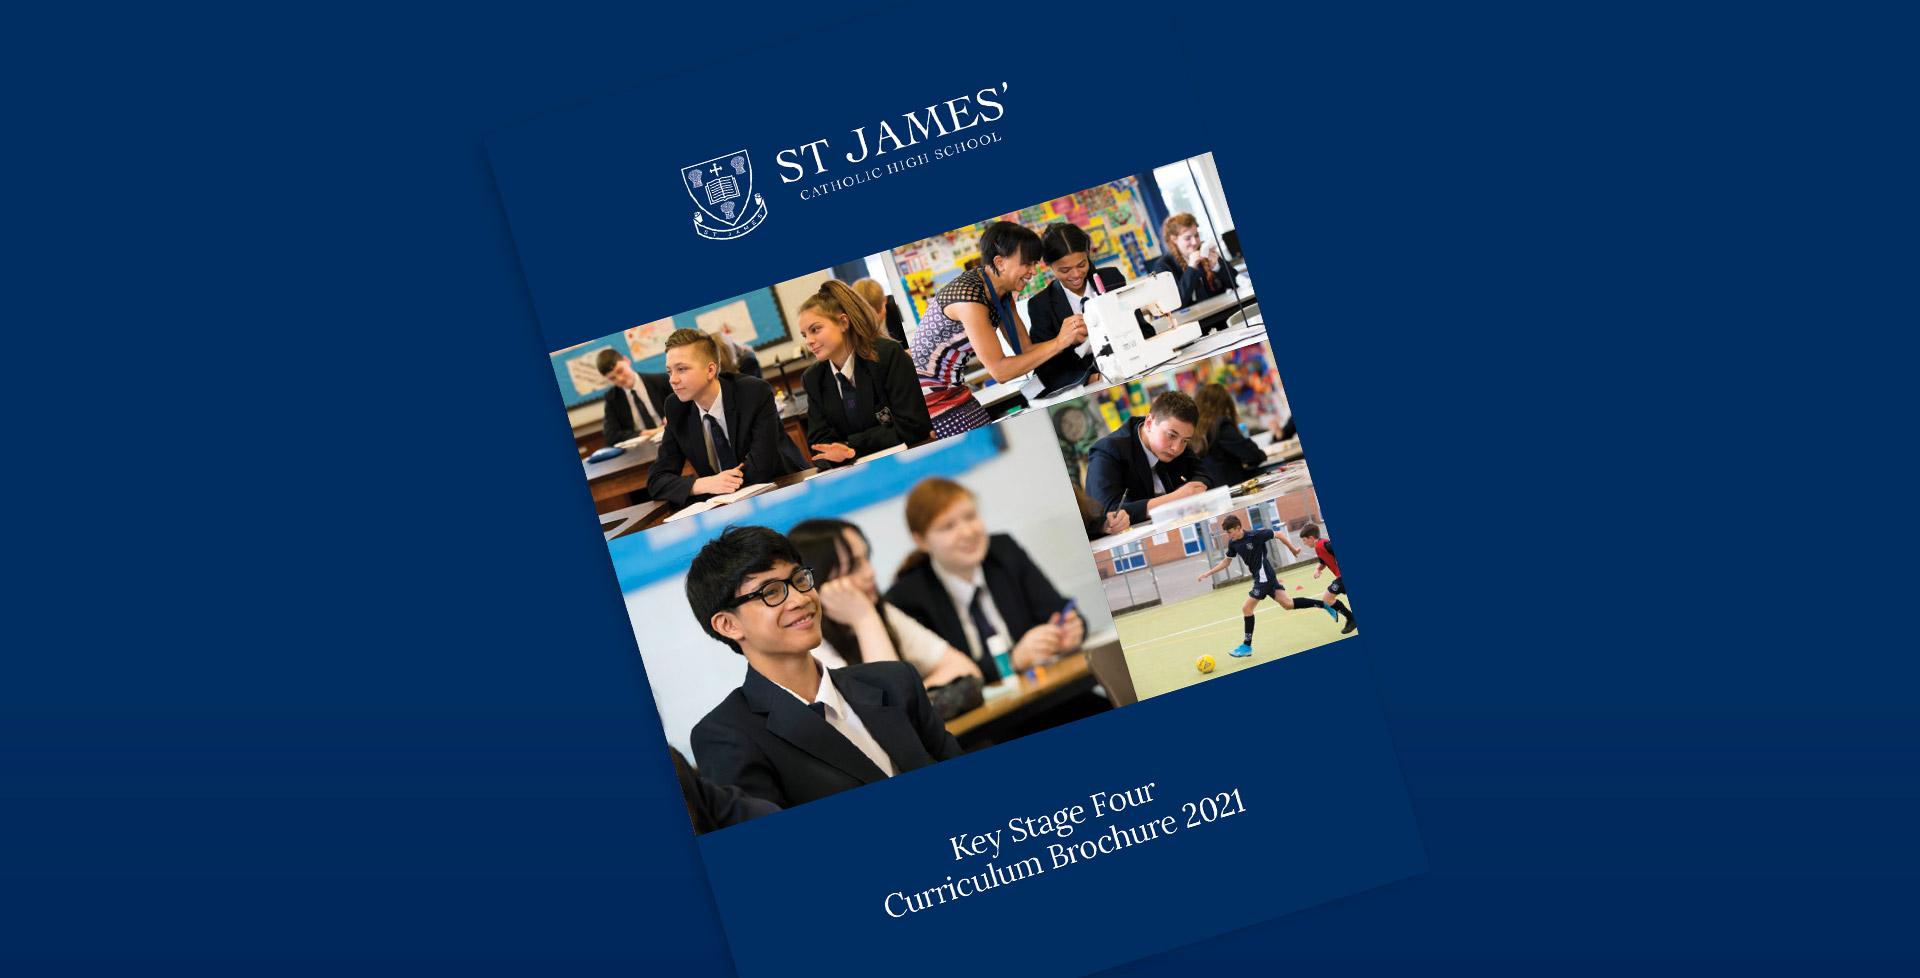 Curriculum Brochure 2021